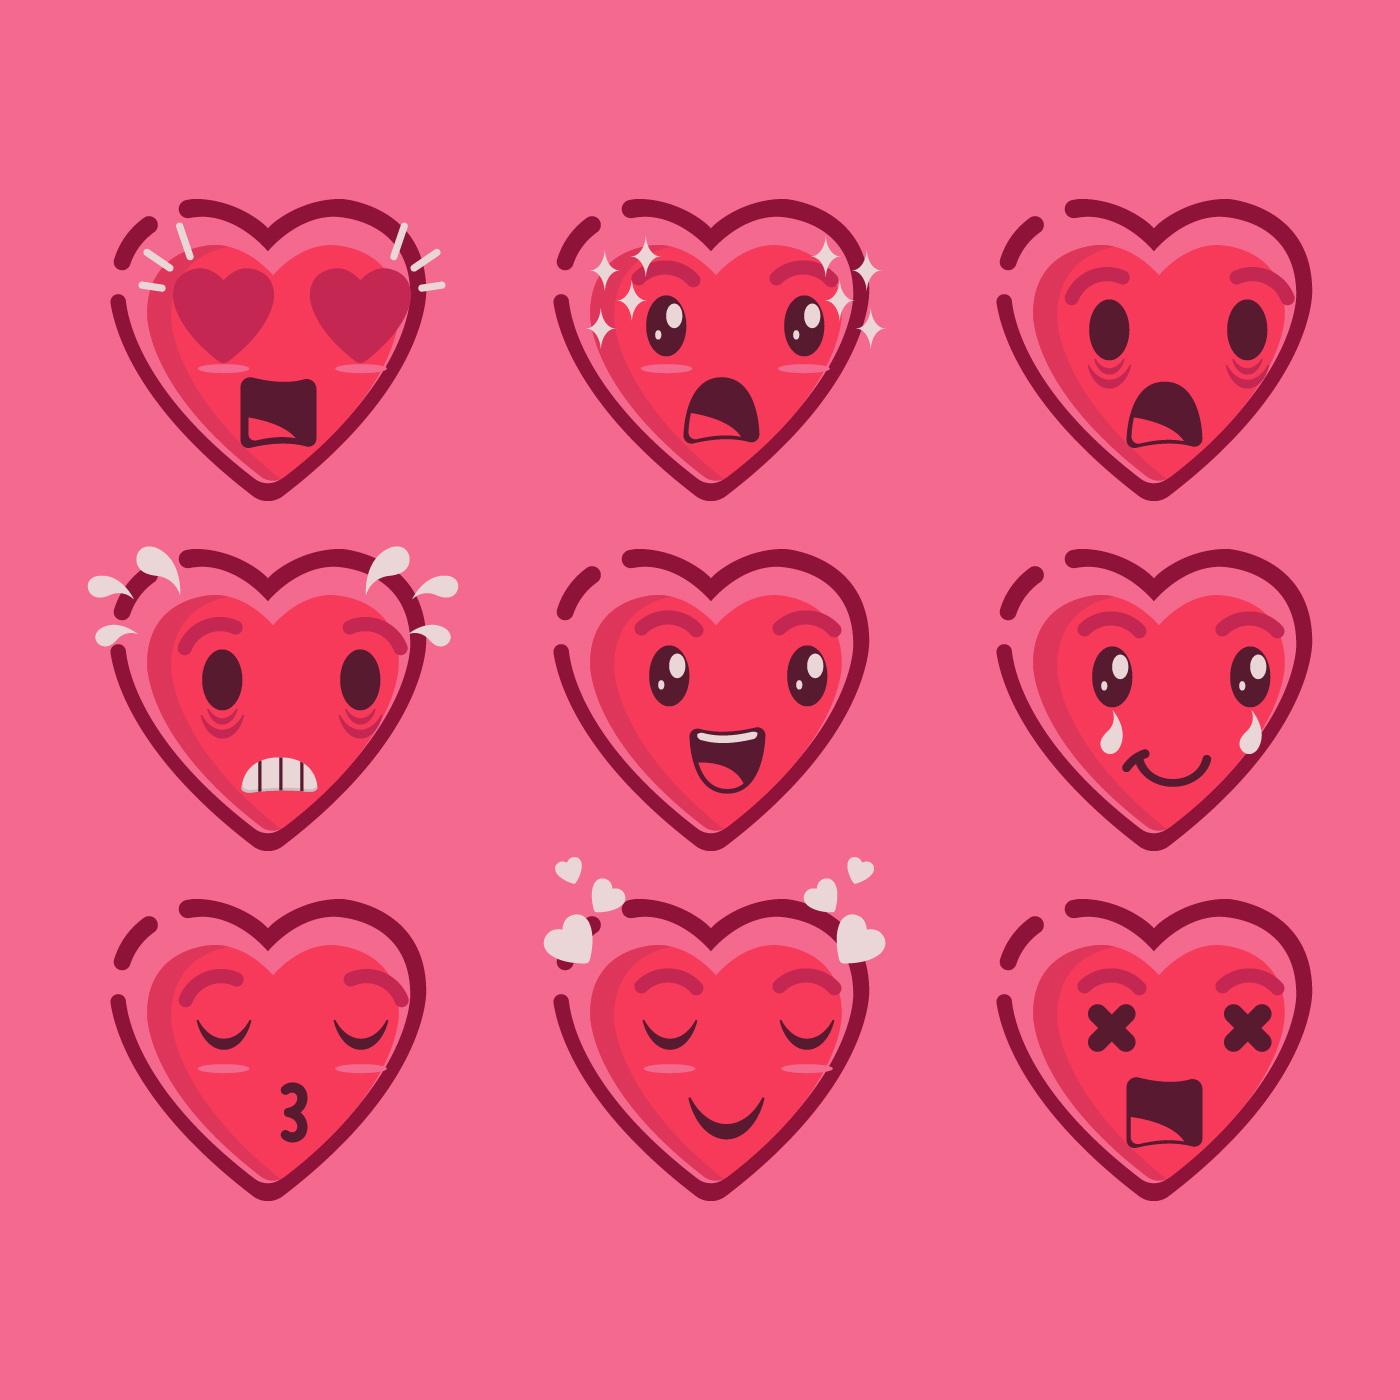 Cute Valentine Emoji Of Hearts Vector - Download Free ...